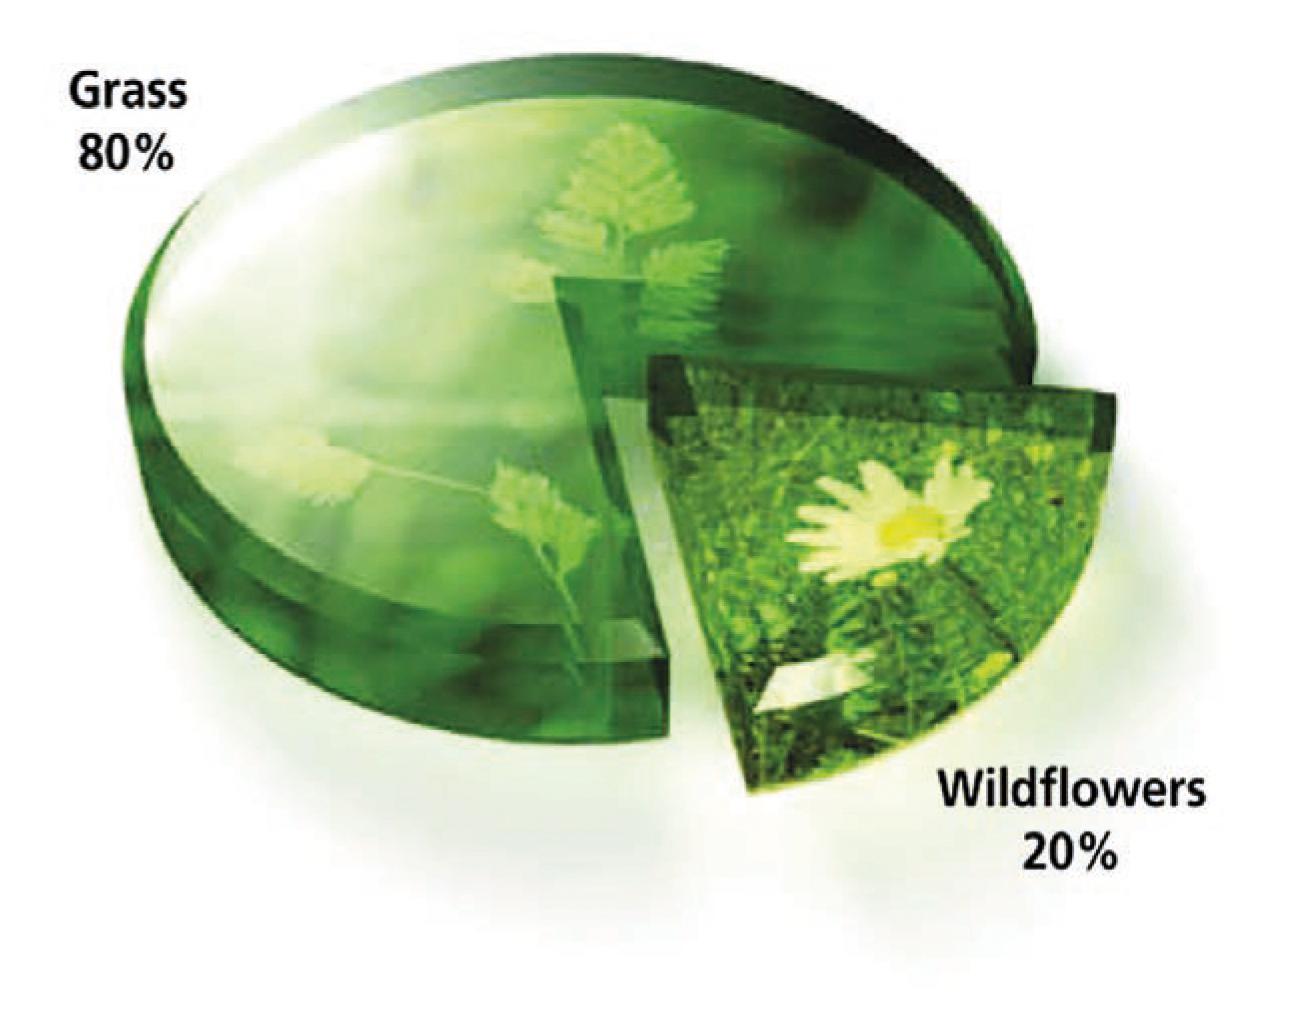 Flora Mixture Pie Chart